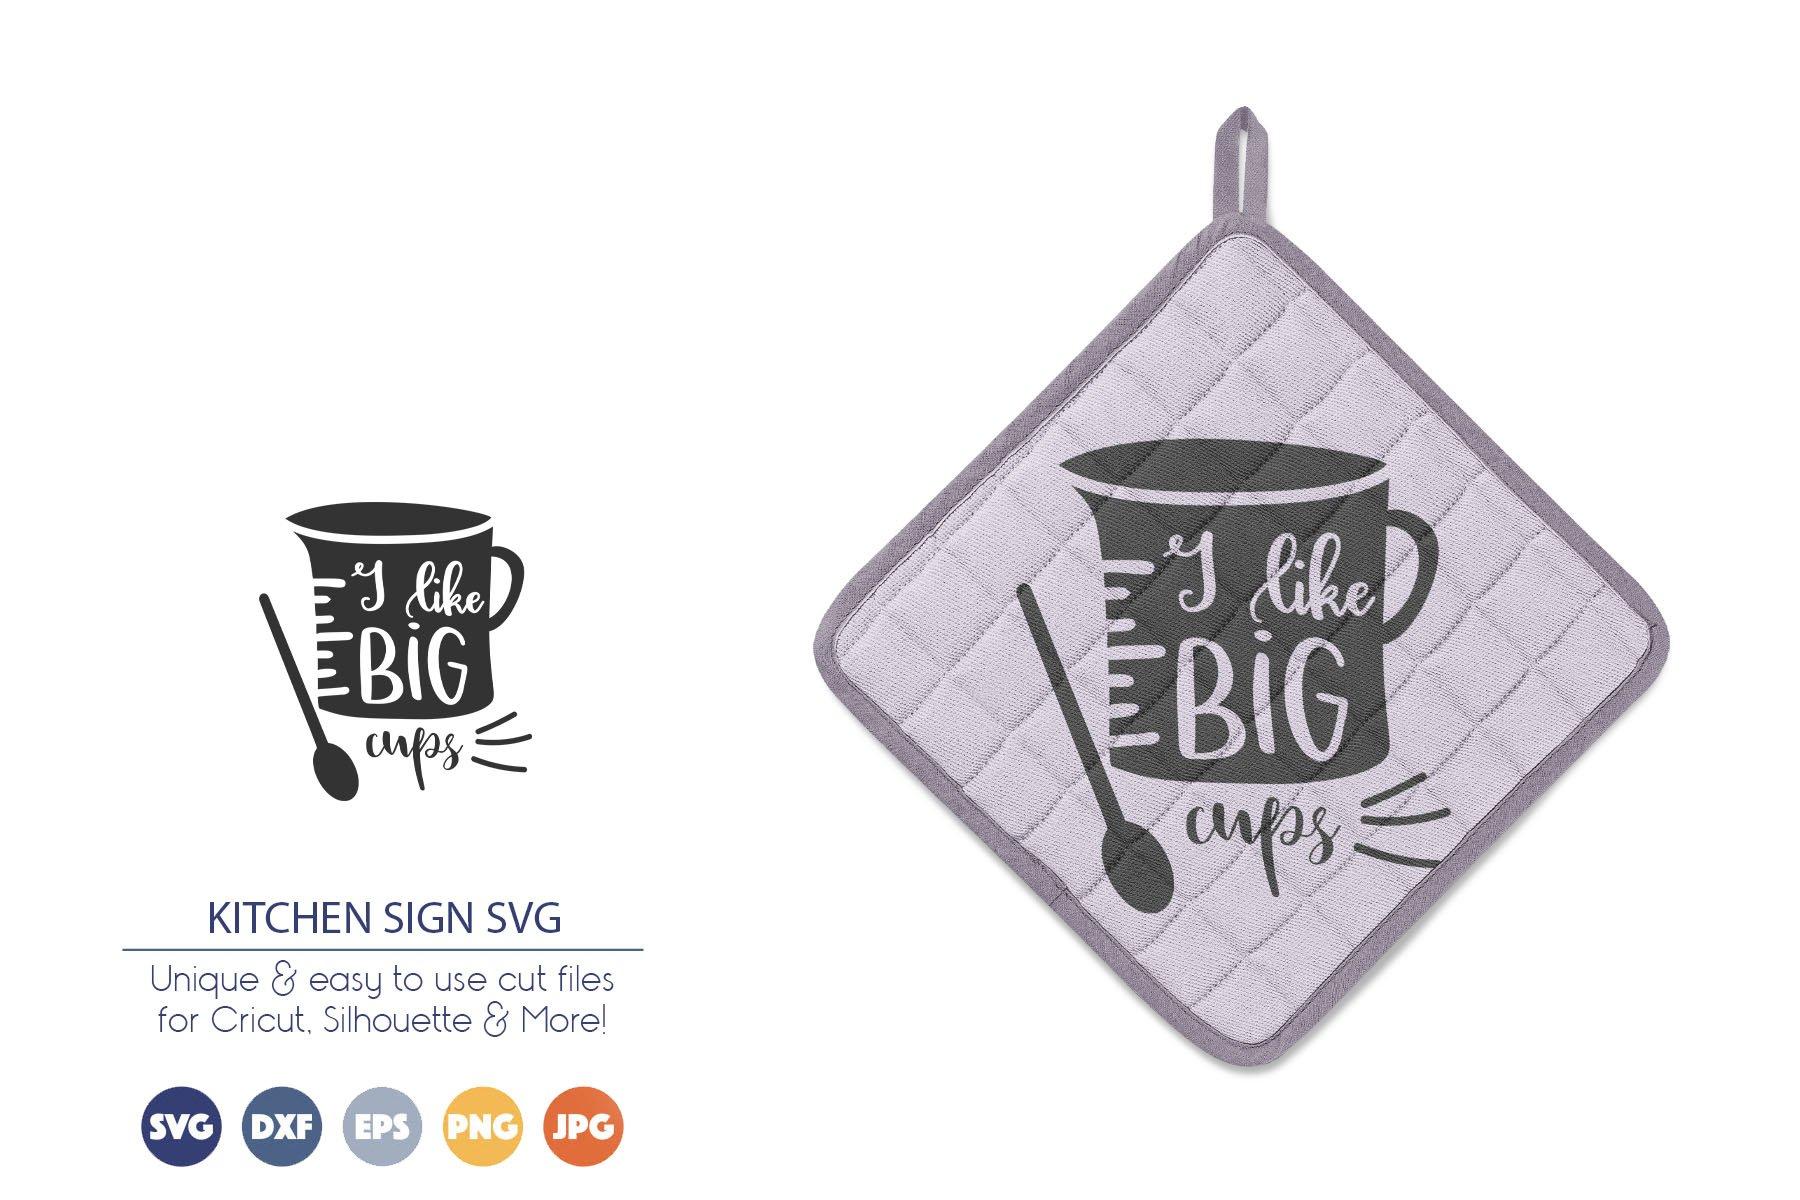 Funny Kitchen Sign SVG | I Like Big Cups SVG example image 1